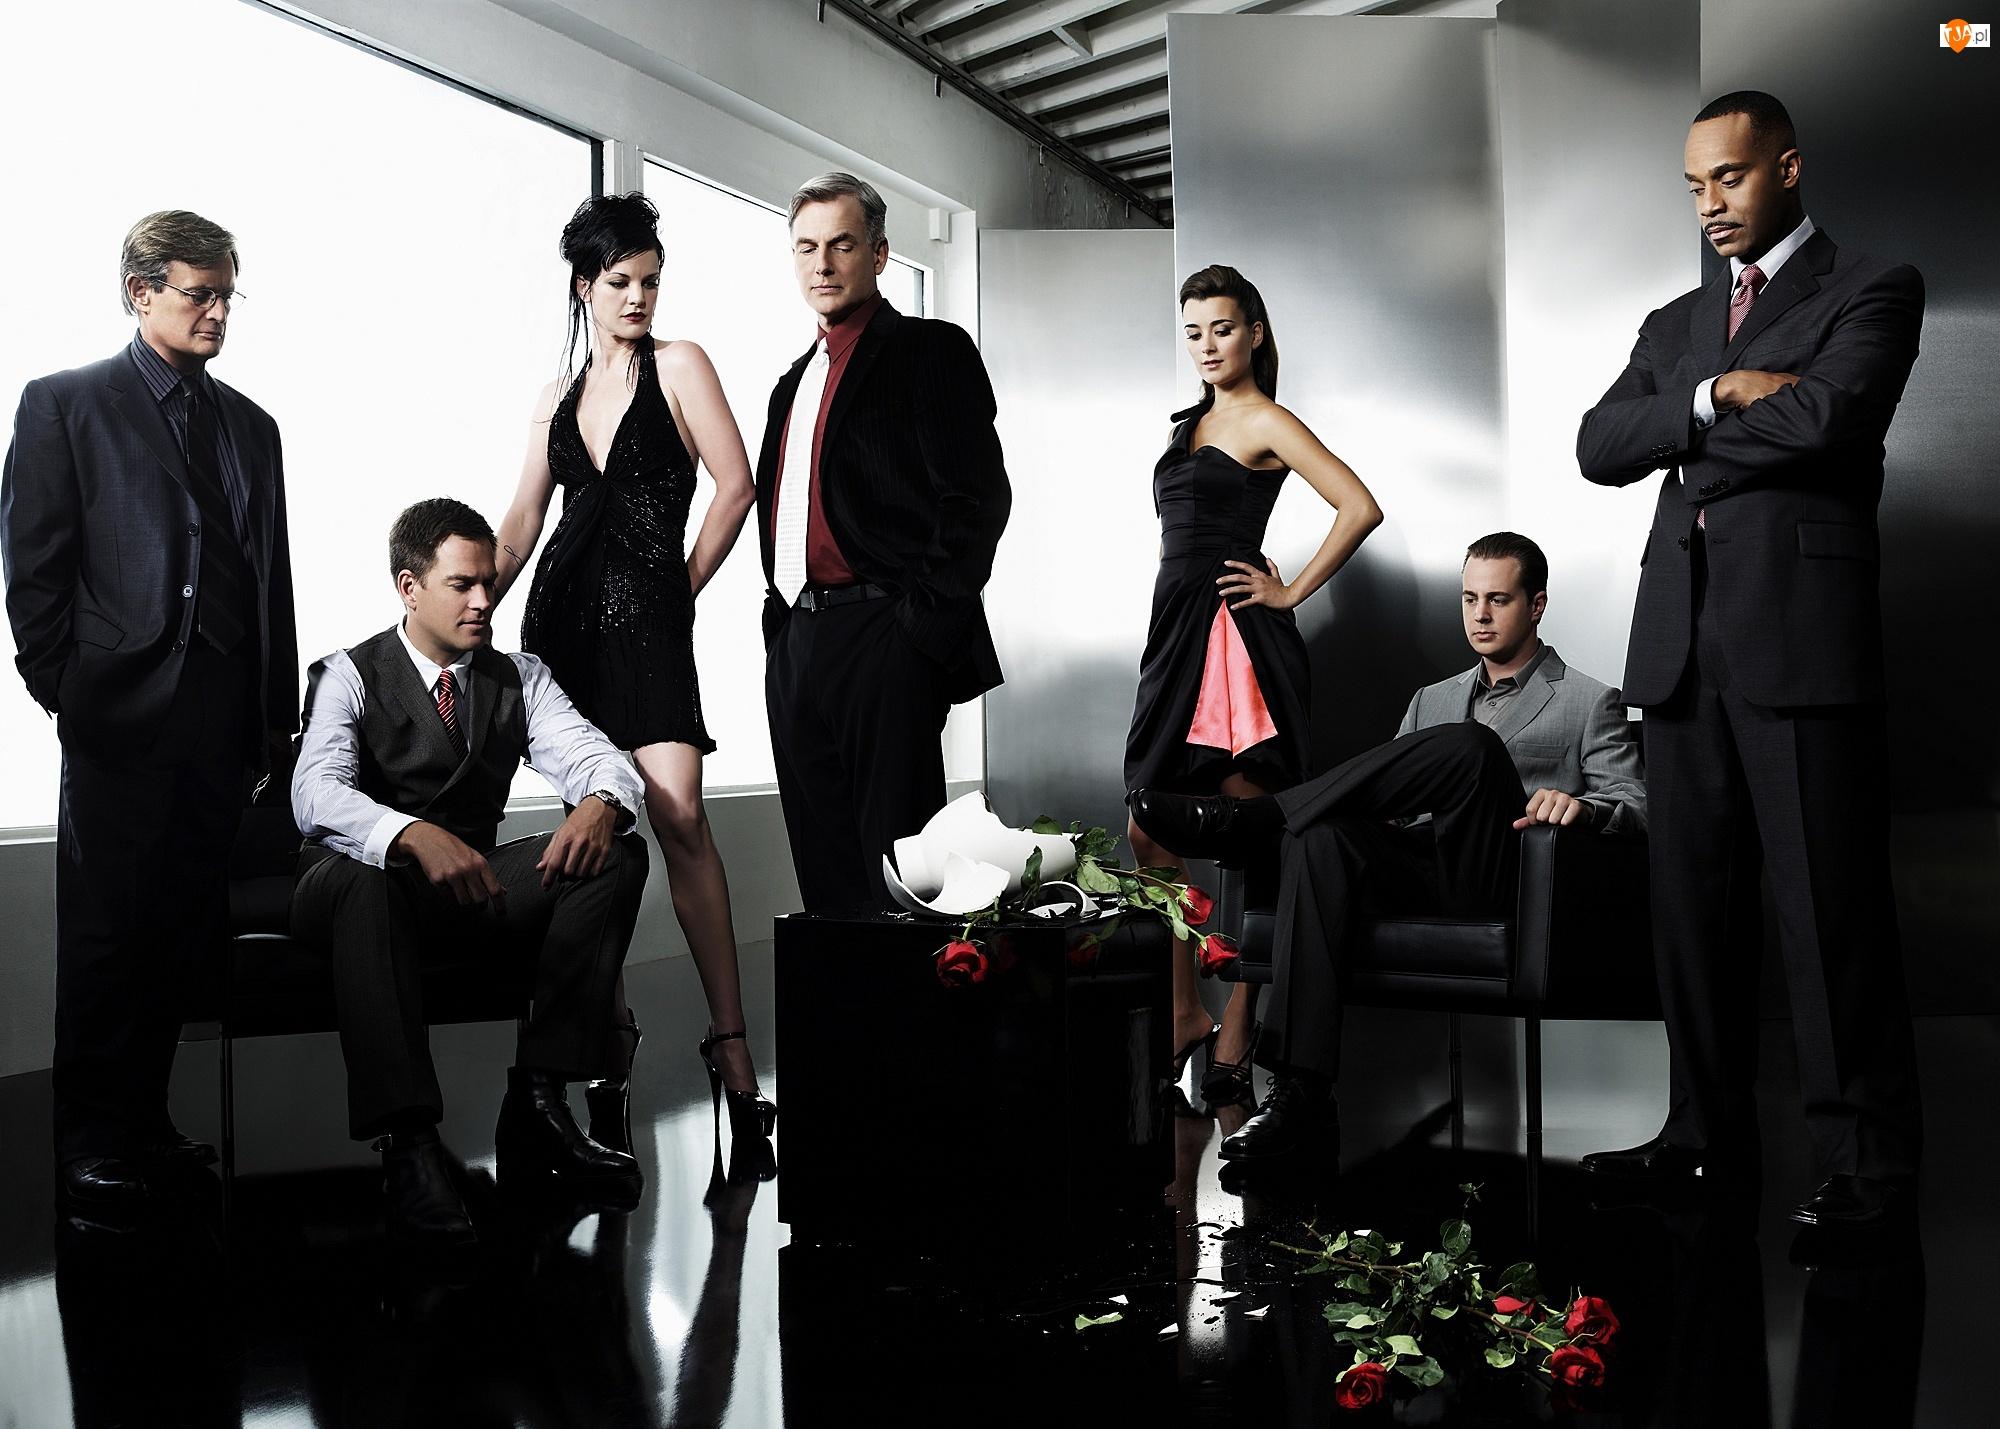 Obsada, Seriale, Agenci NCIS, Aktorzy